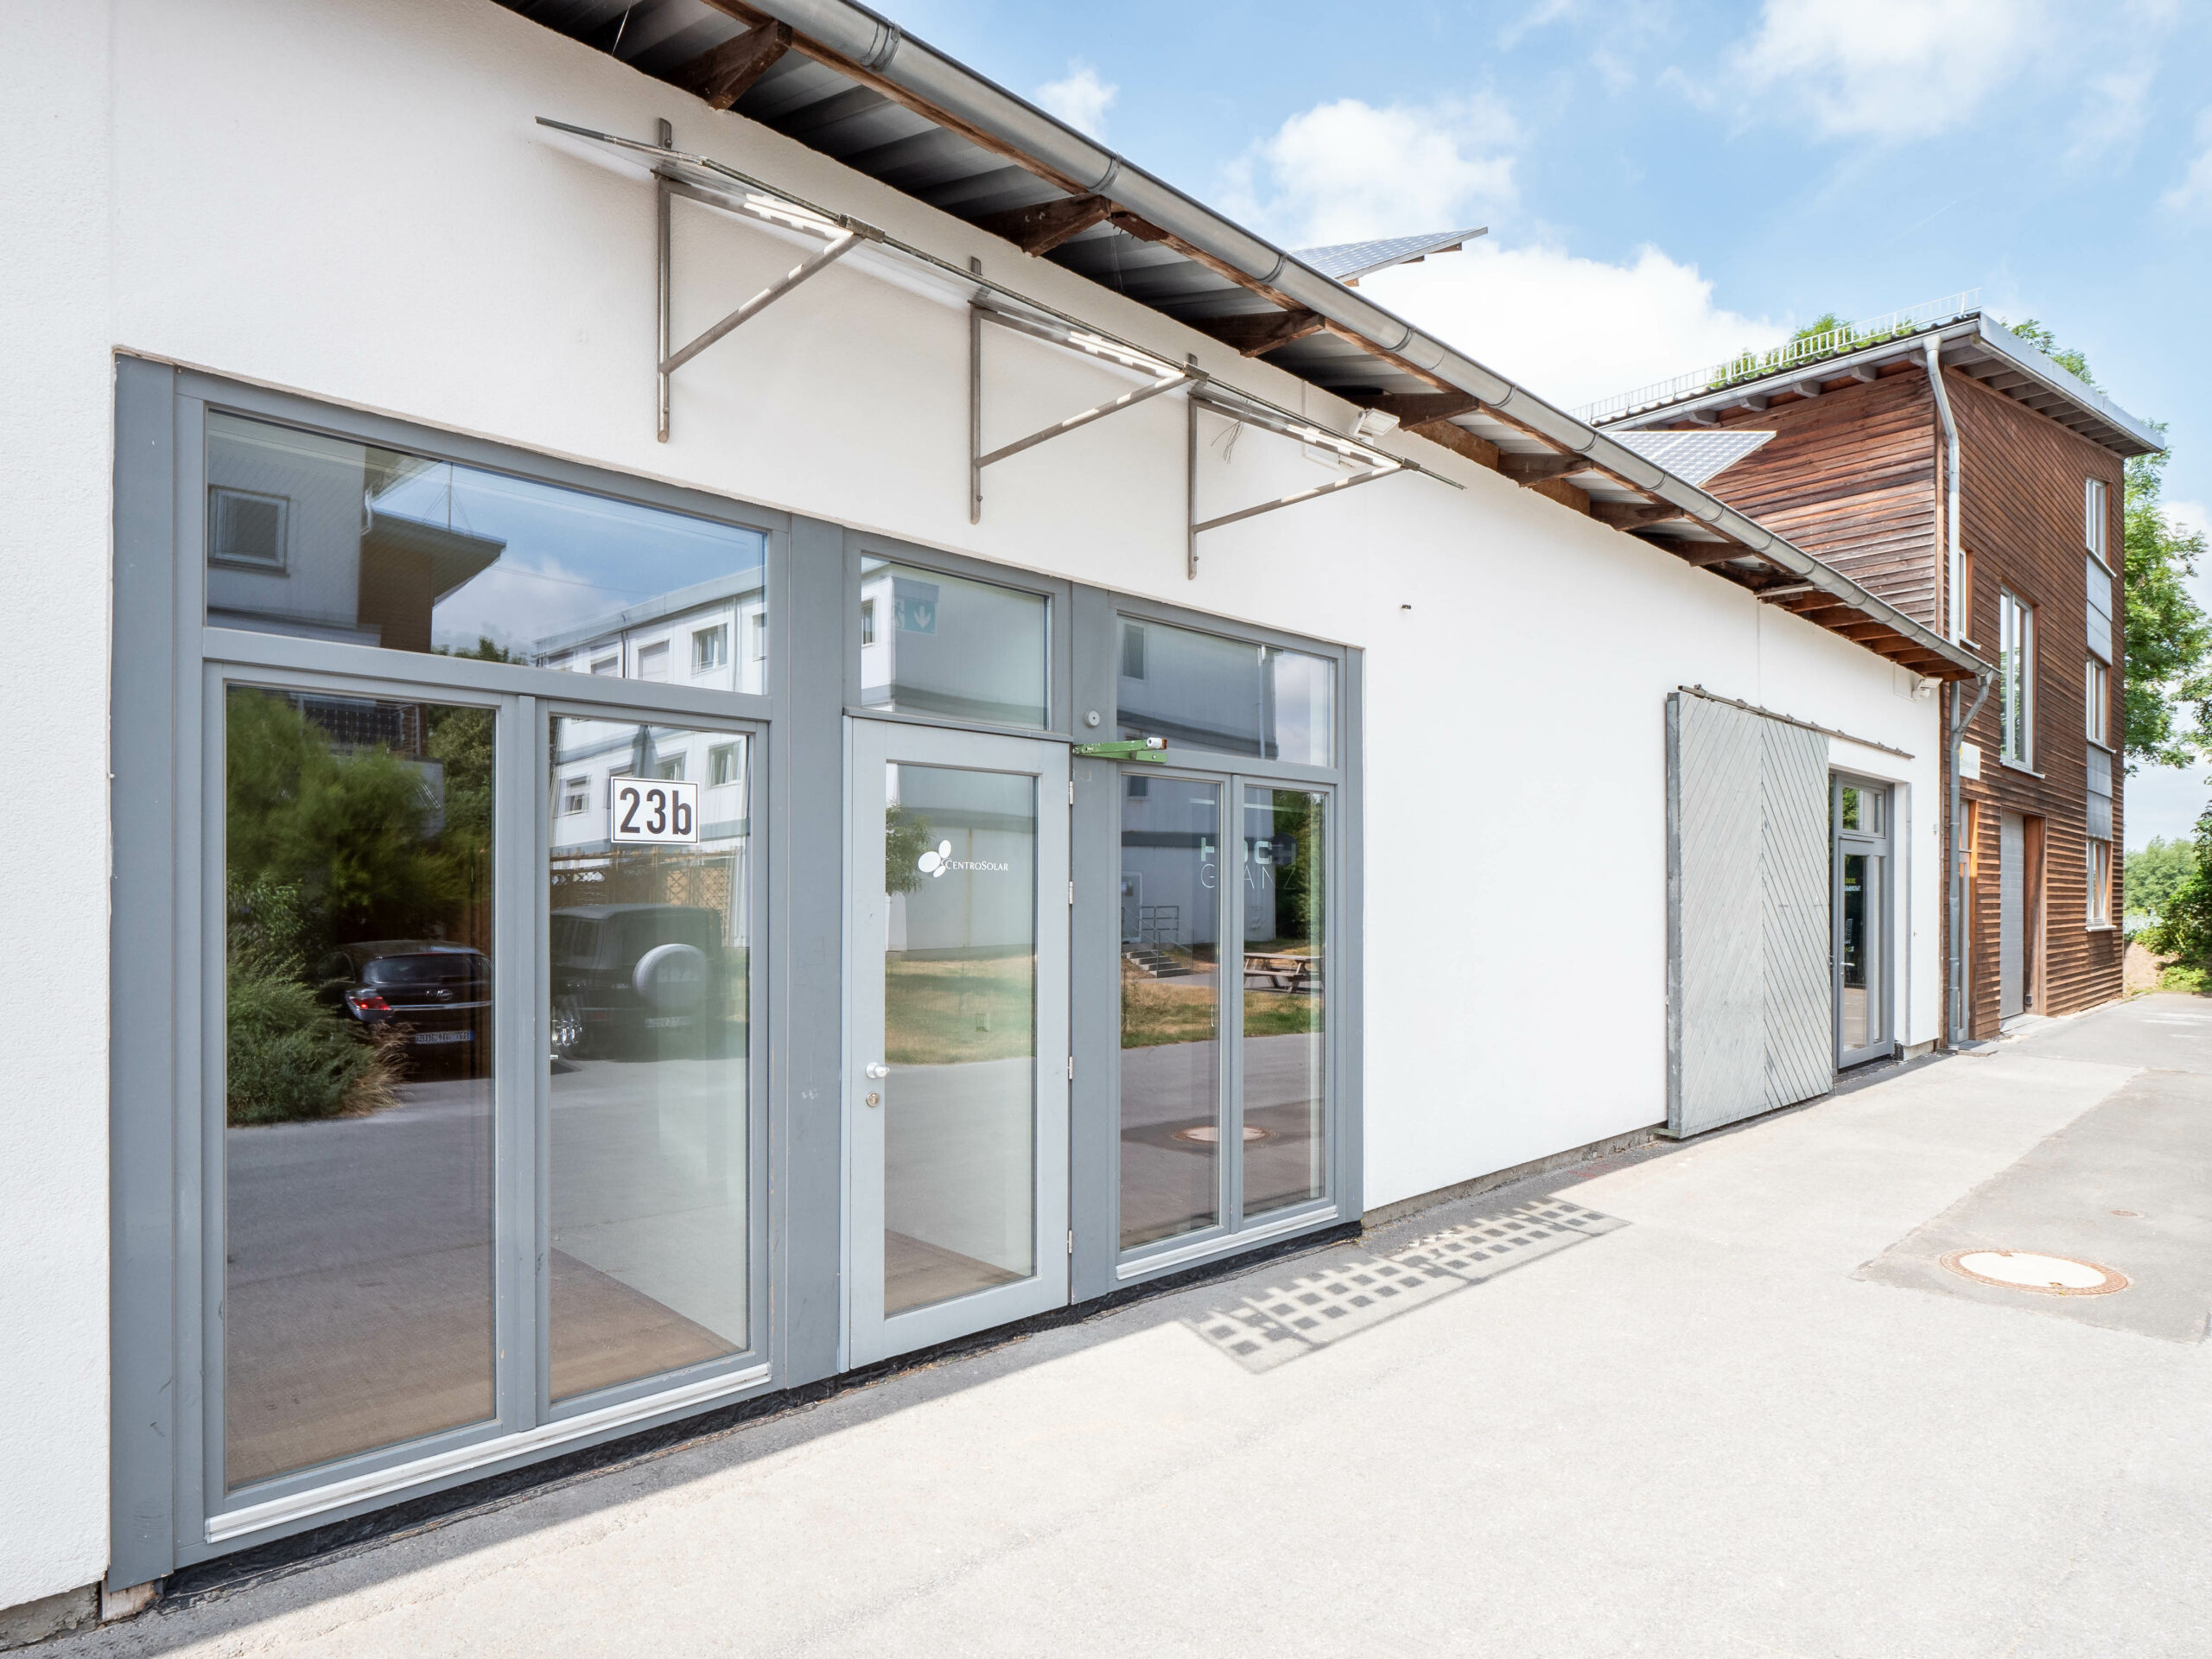 Büroobjekt in Paderborn